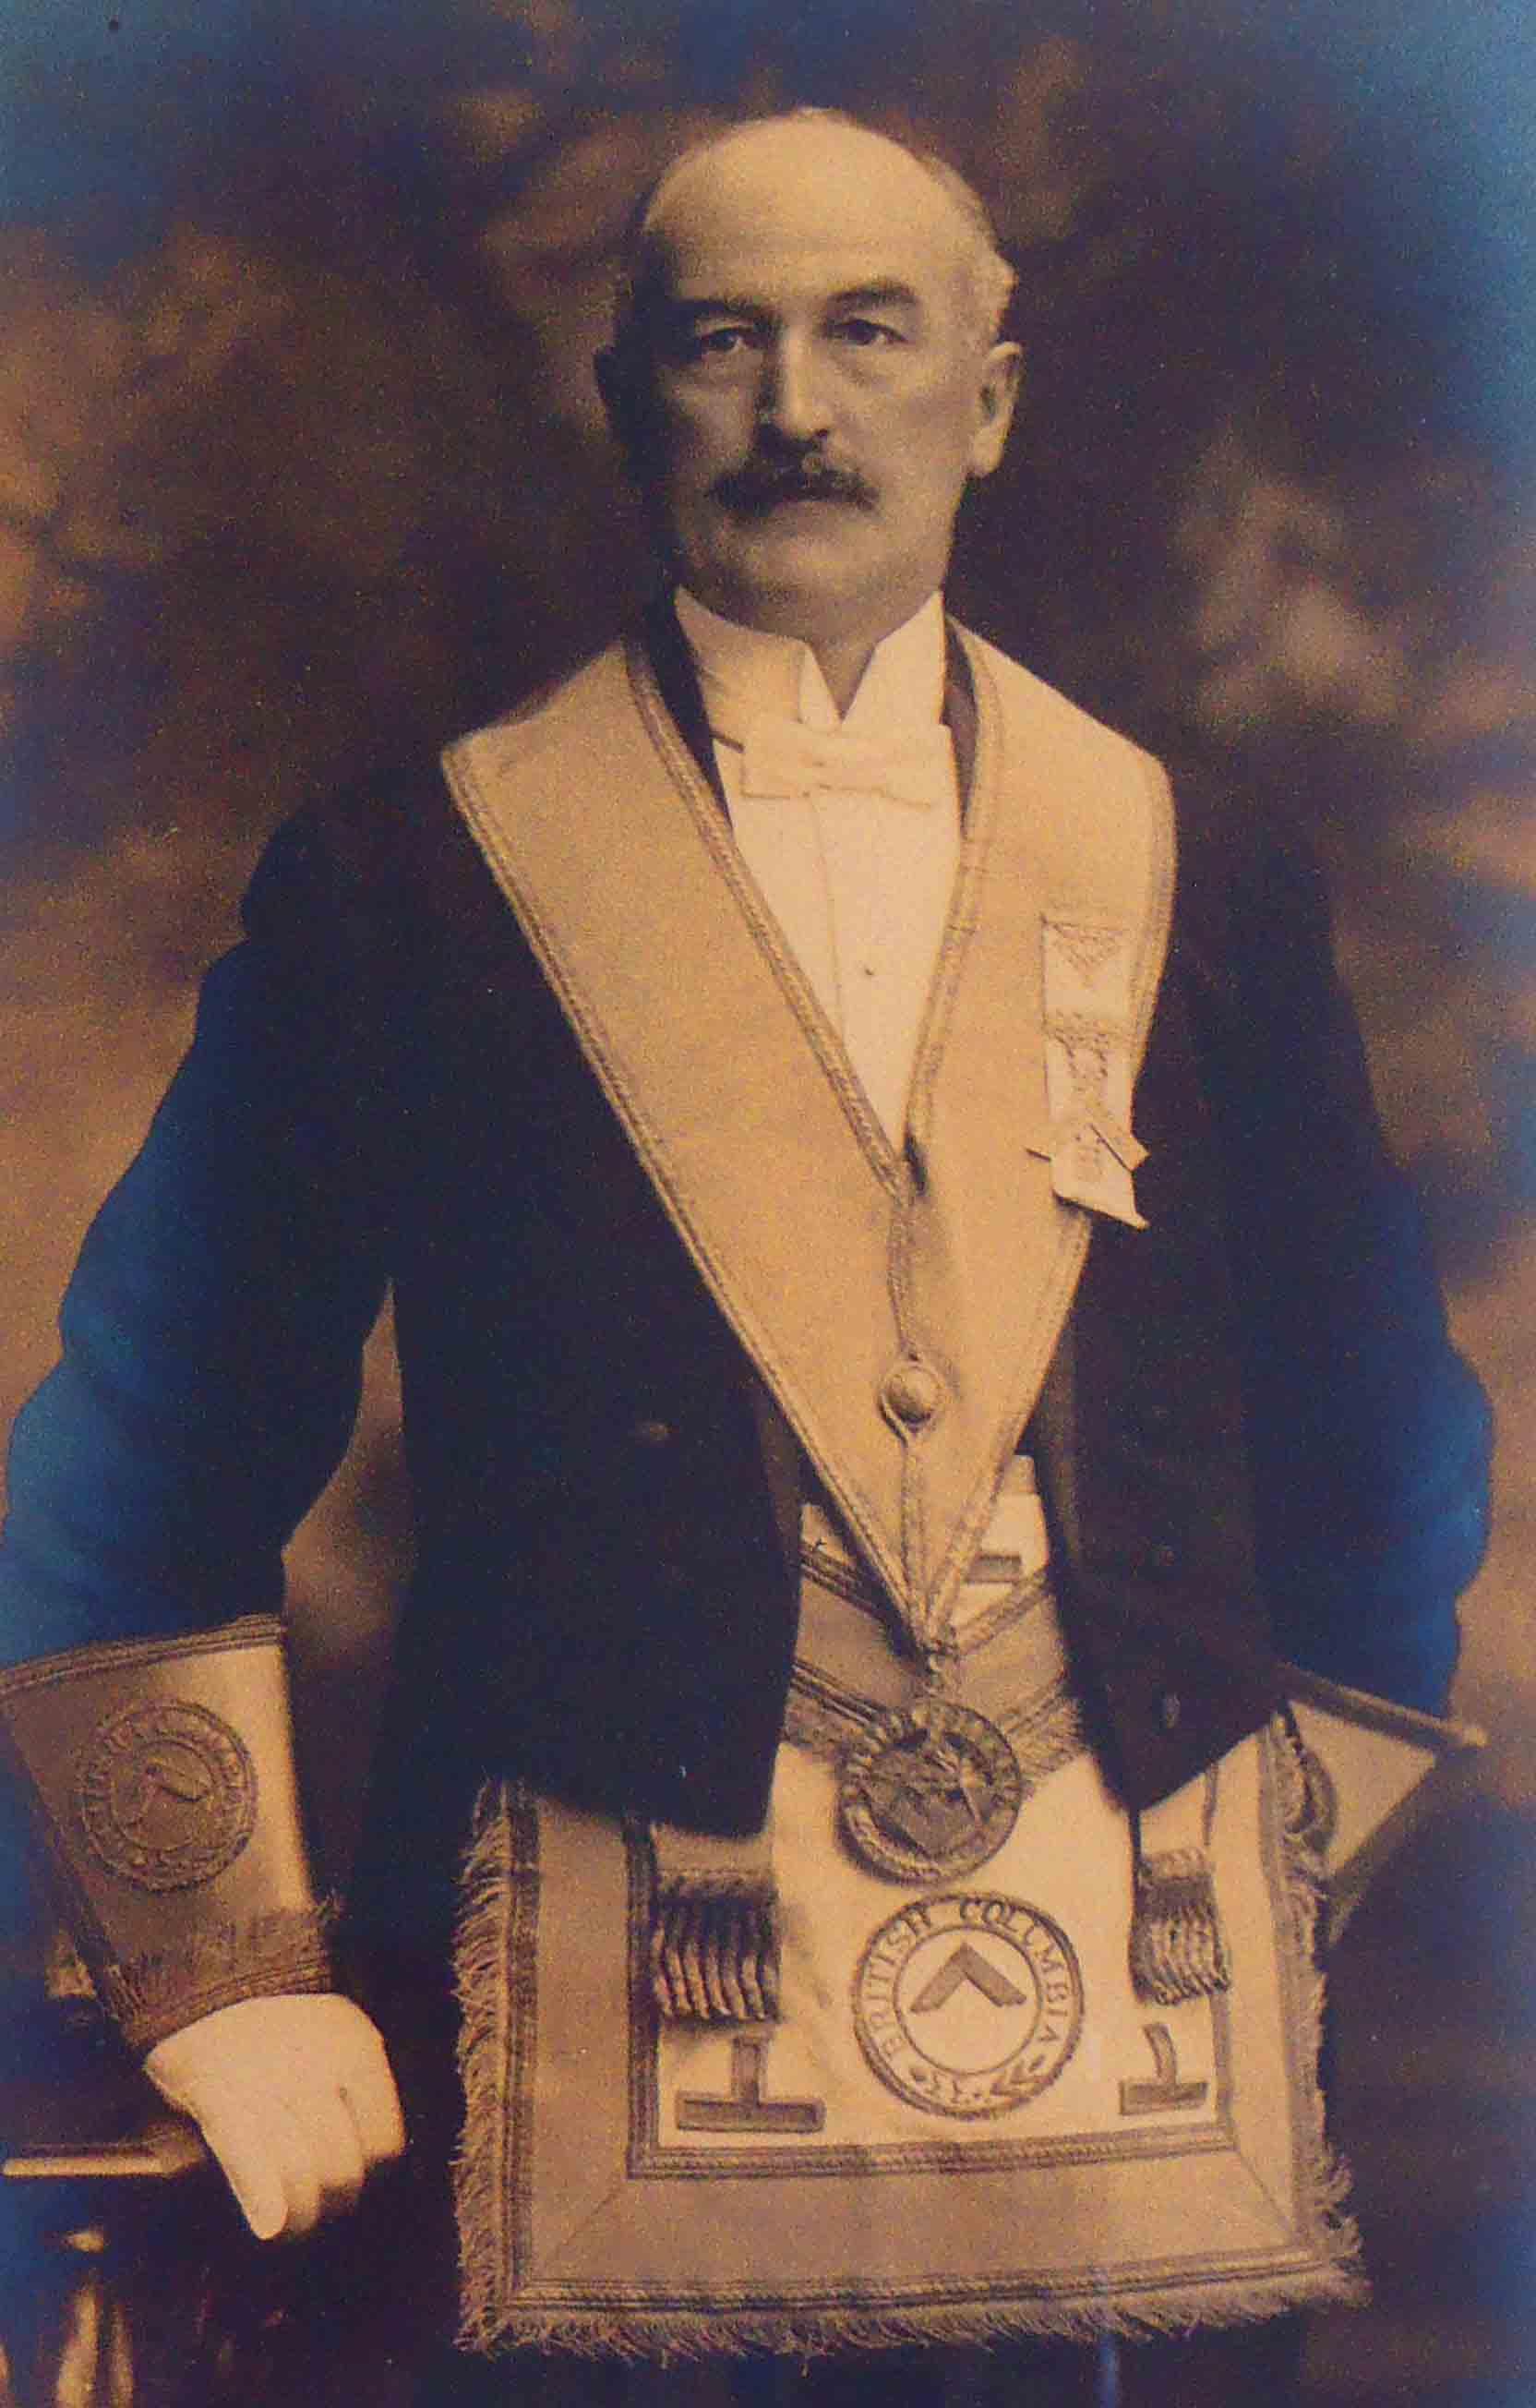 Thomas Pitt, circa 1919